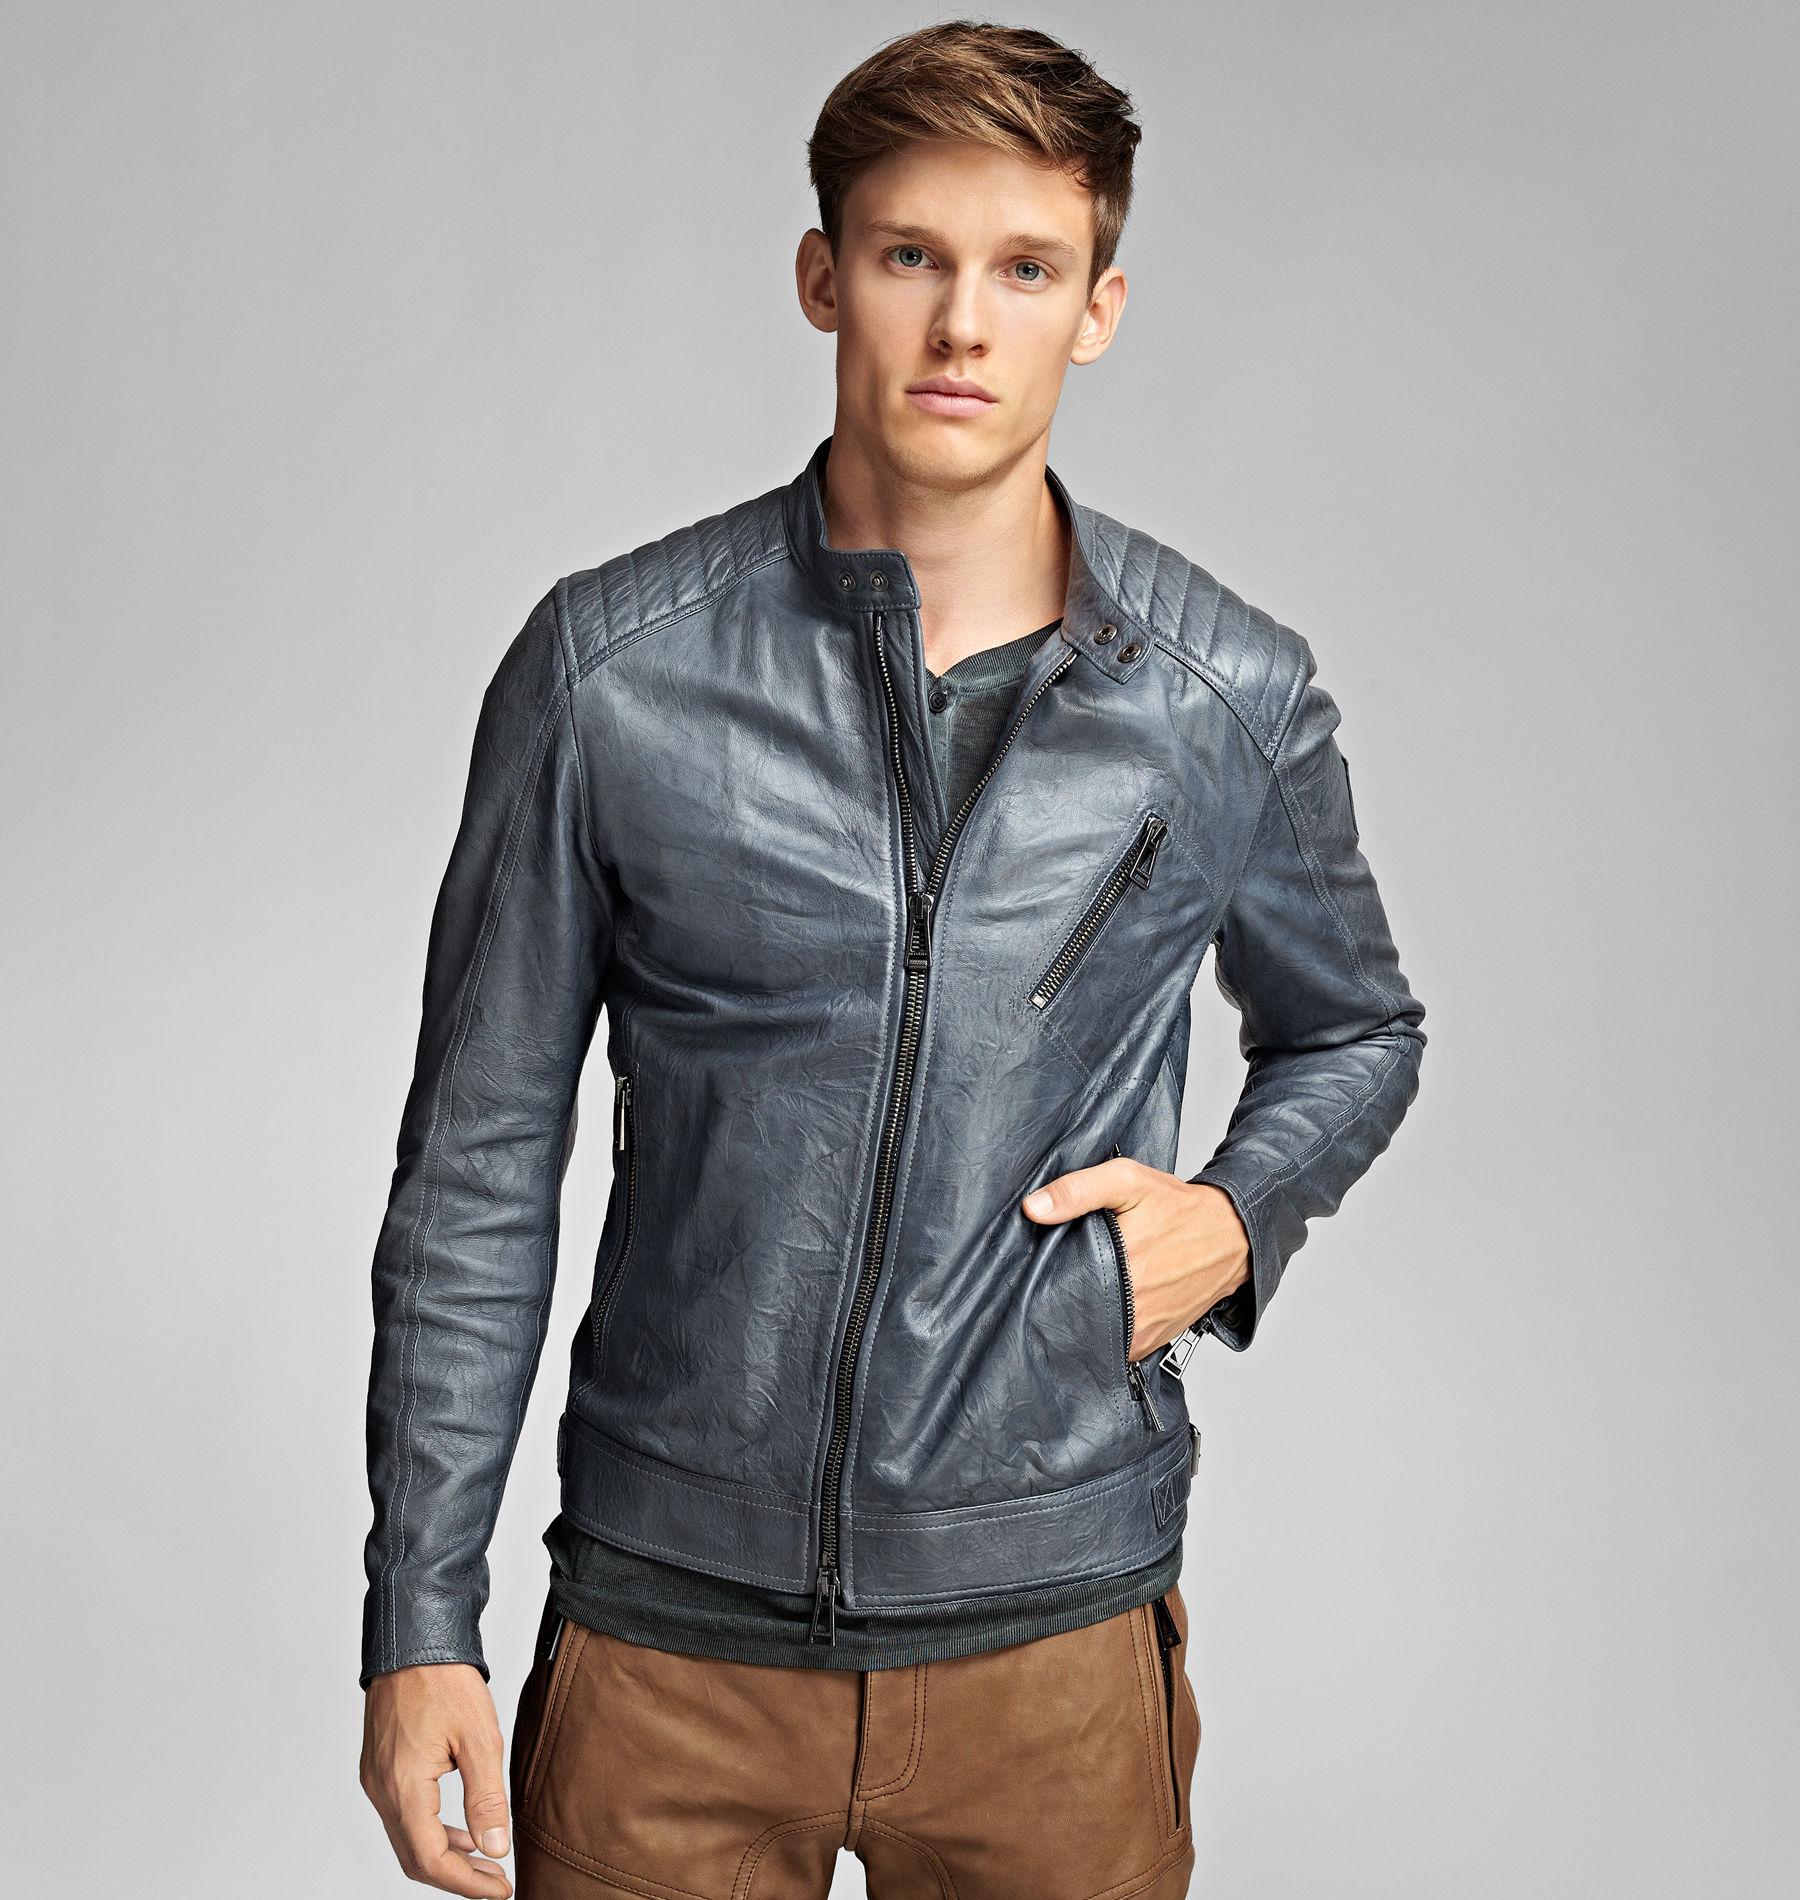 Belstaff Leather Jacket Blue